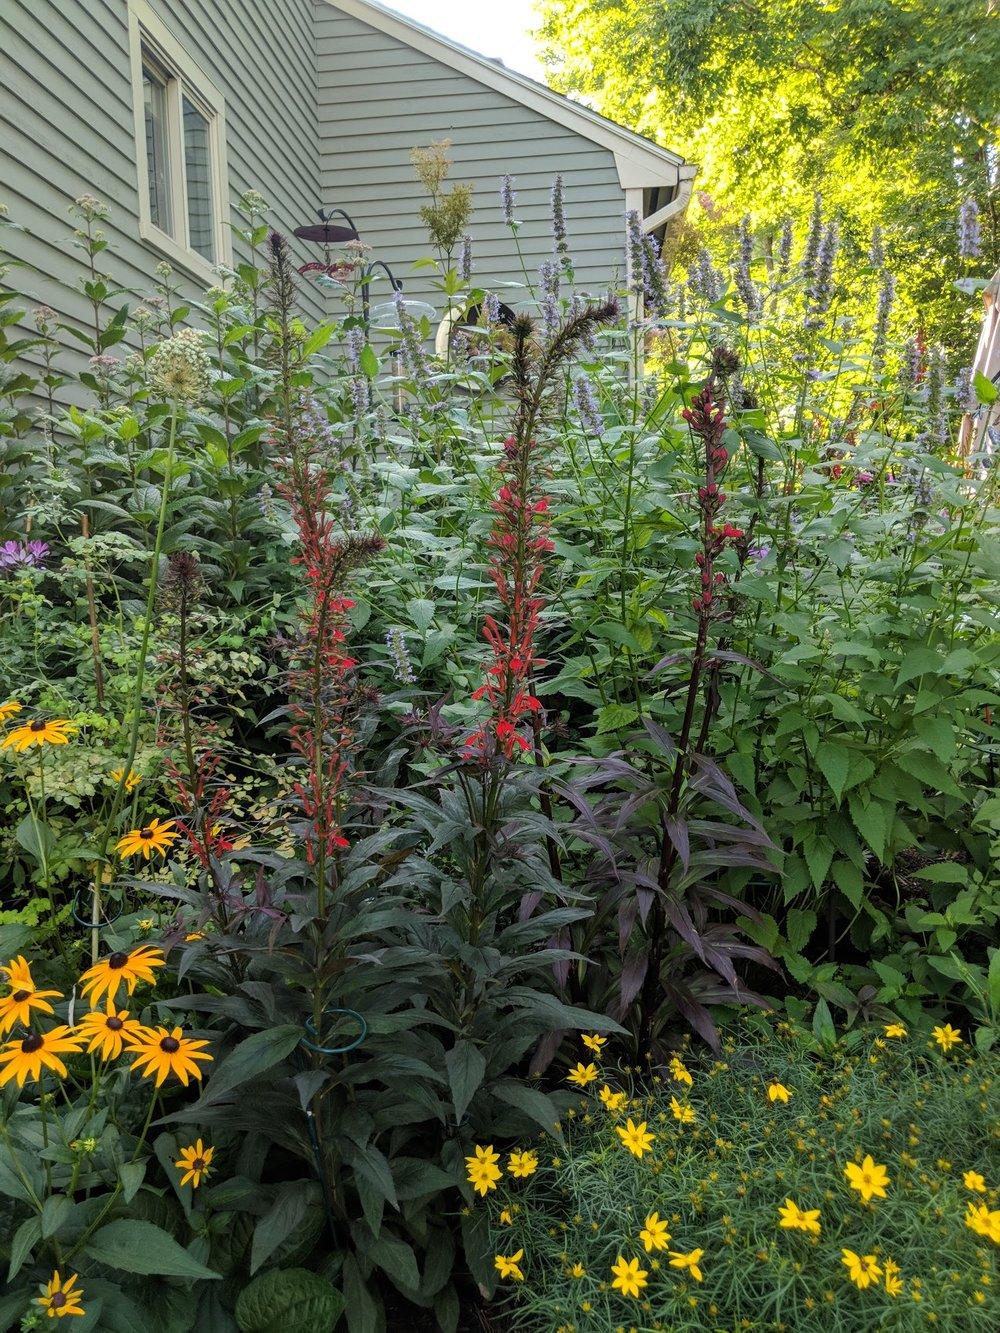 Jul 30: Lobelia cardinalis' red spikes feed hummingbirds and bumblebees